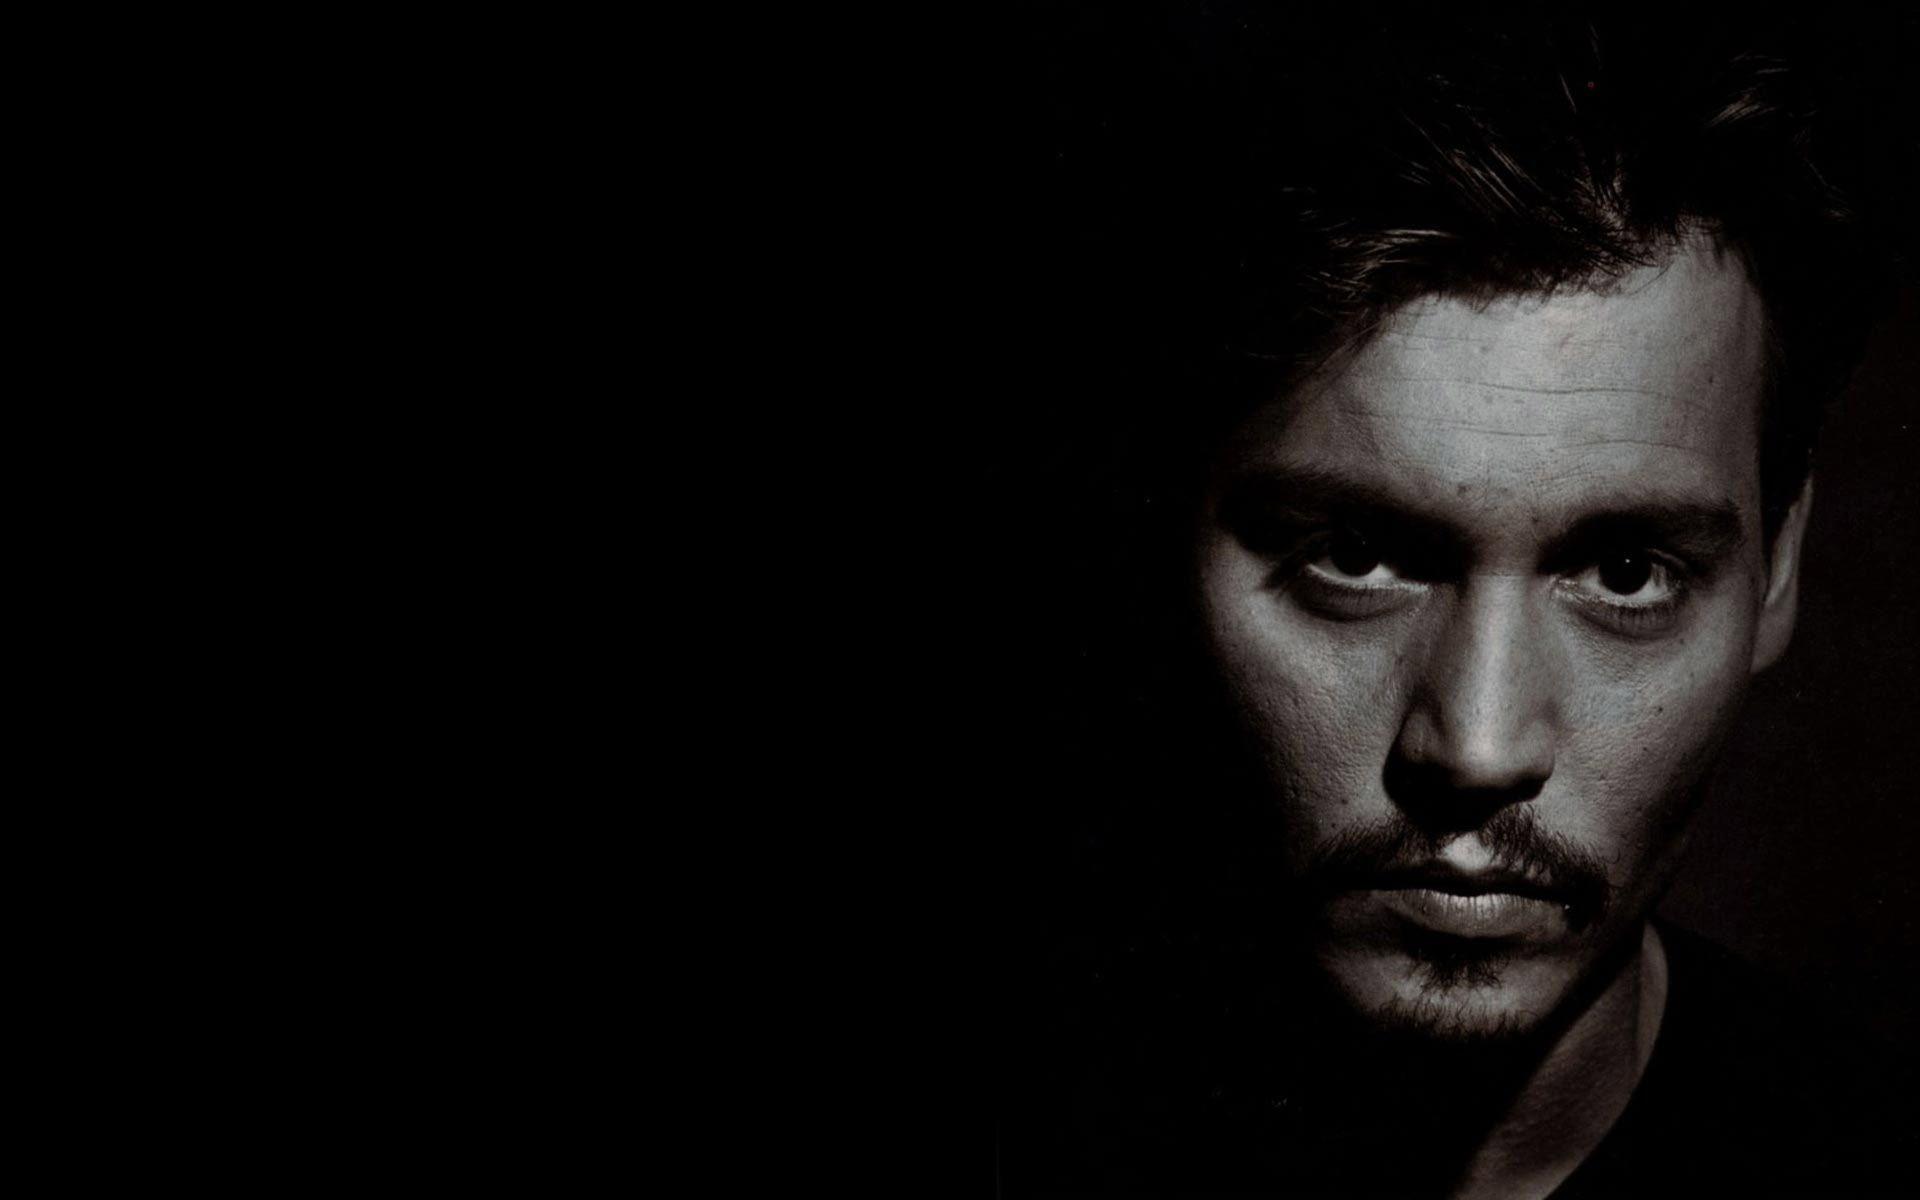 Johnny Depp Wallpapers Hd Rainbow Wallpapers Johnny Depp Johnny Depp Biography Johnny Depp Wallpaper